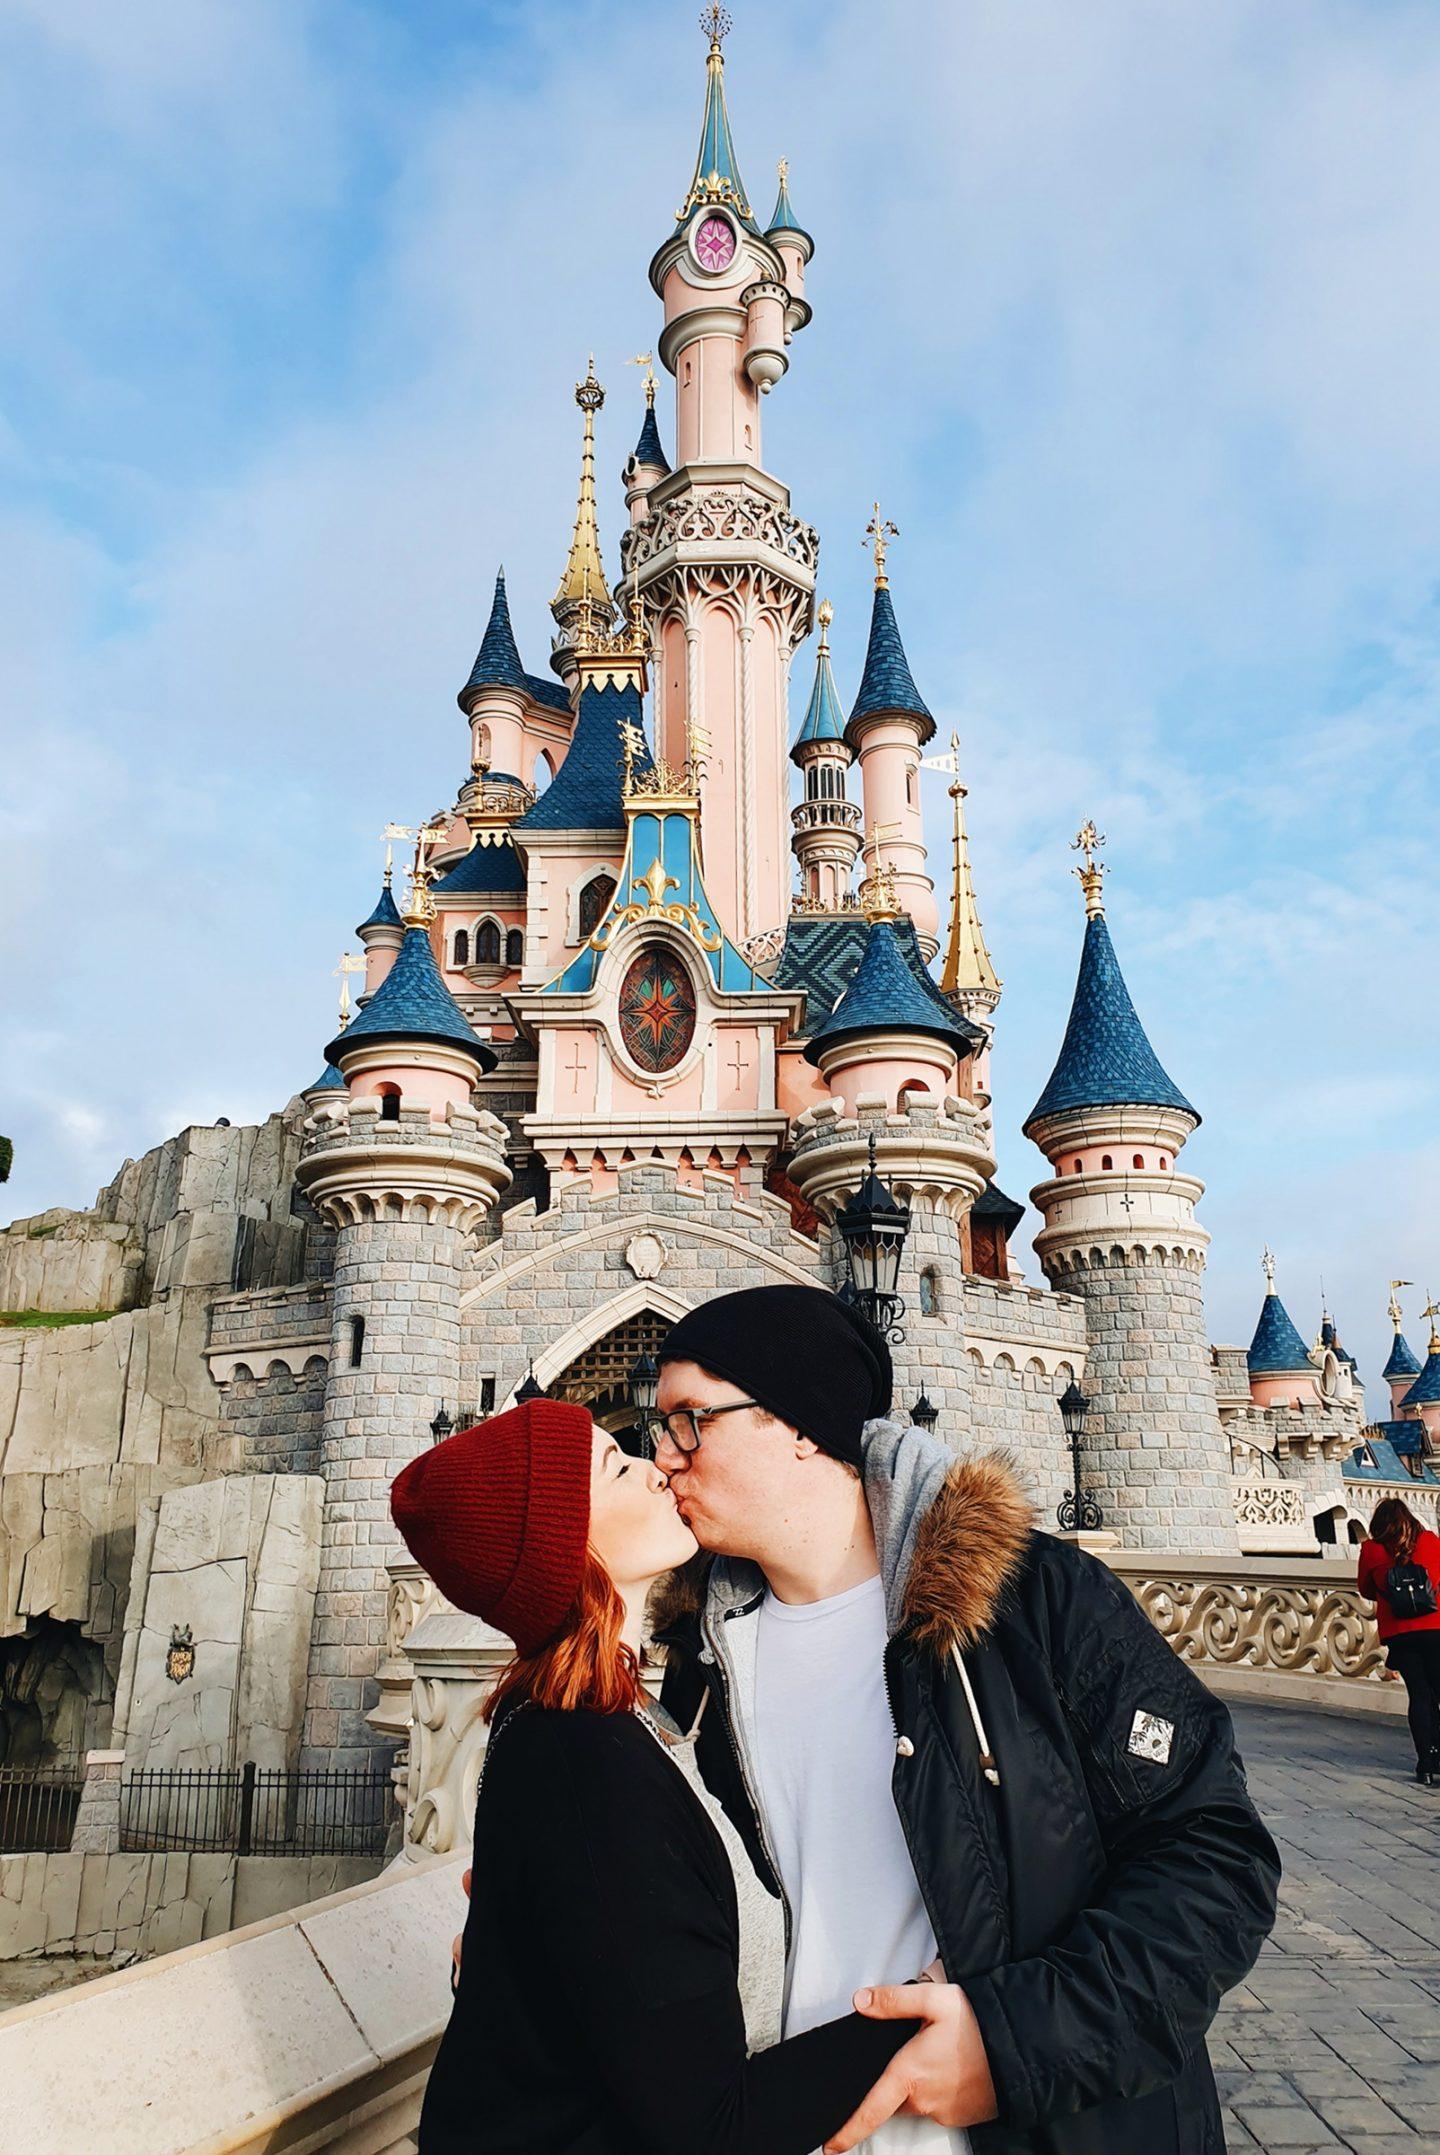 Disneyland paris mit flug | Disneyland Paris Angebote ...